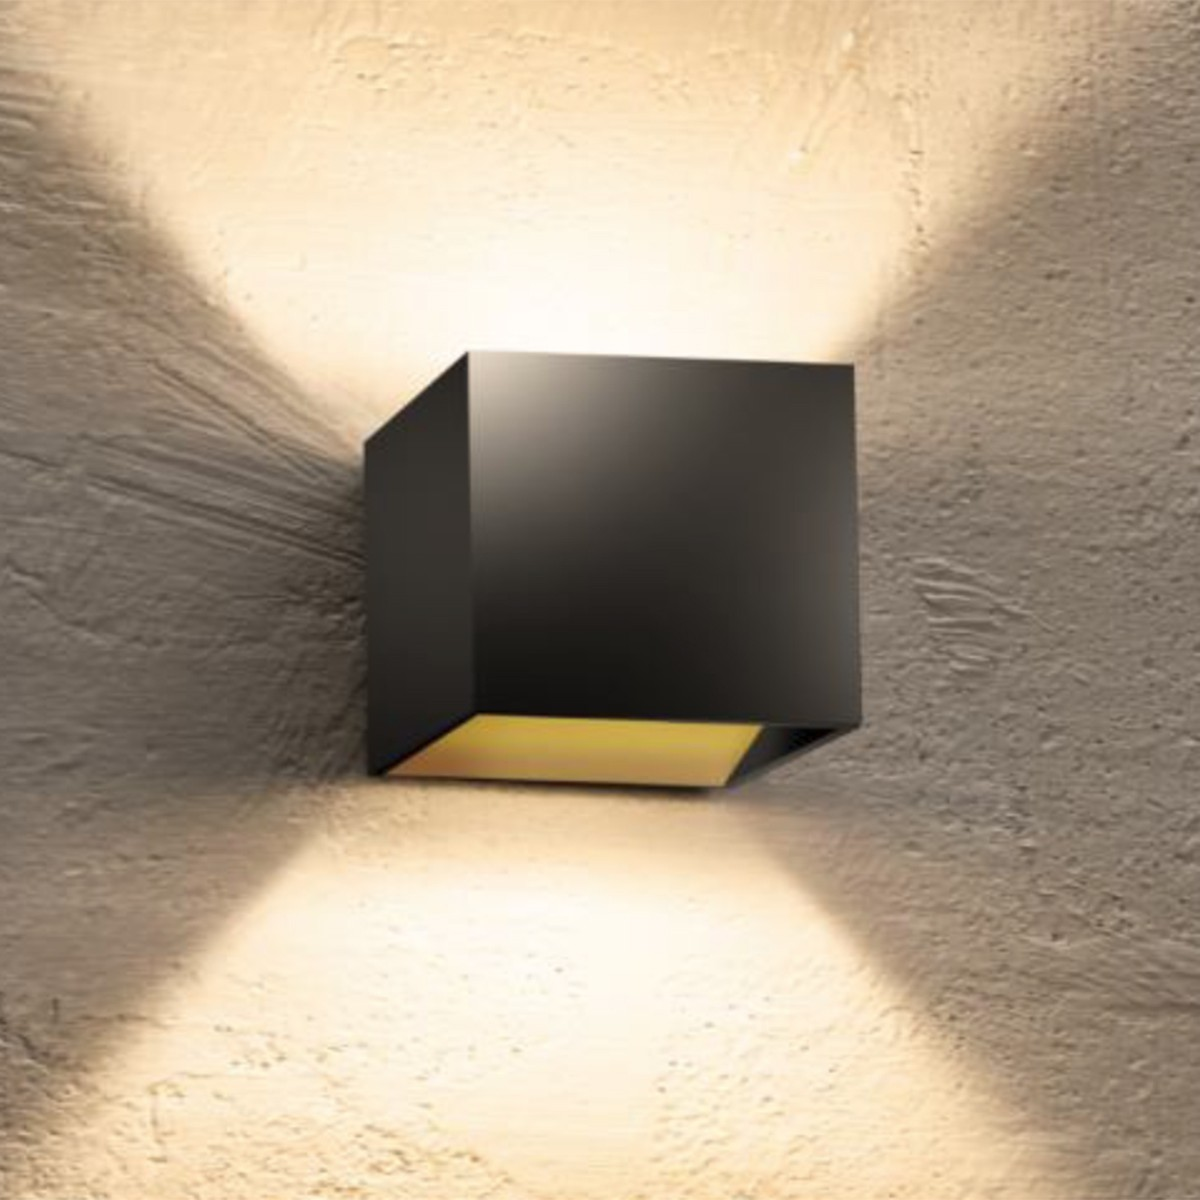 Bruck Cranny LED W Wandleuchte, schwarz / innen Gold